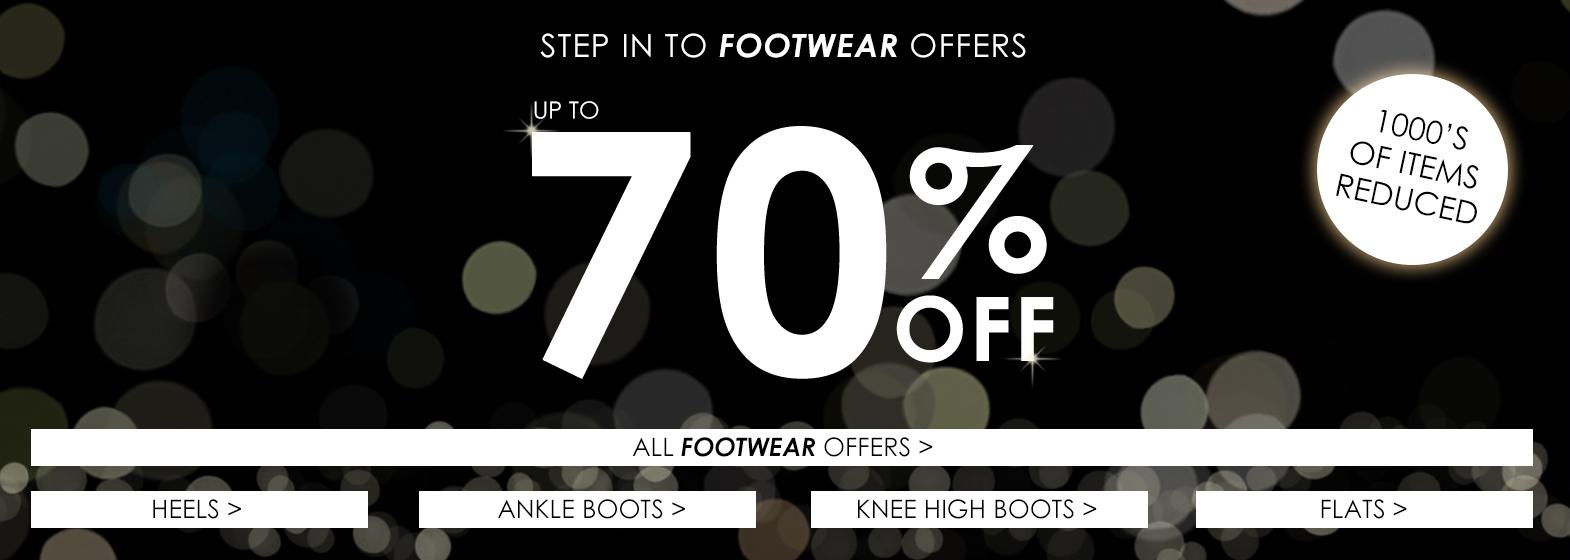 Black Friday Footwear Offers >